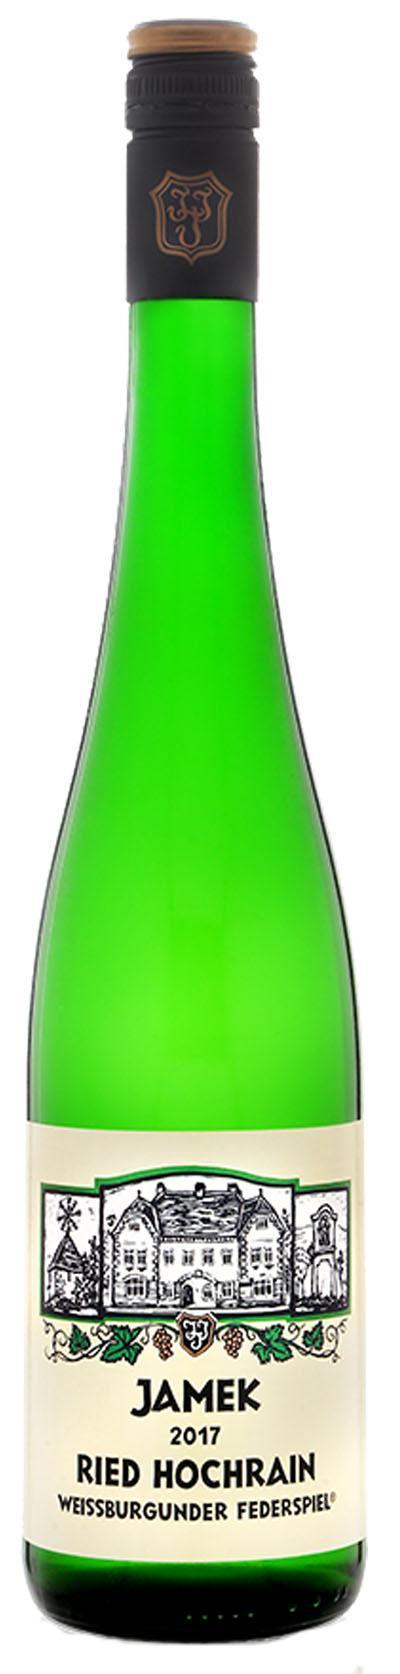 Weißburgunder Smaragd Hochrain 2017 / Jamek